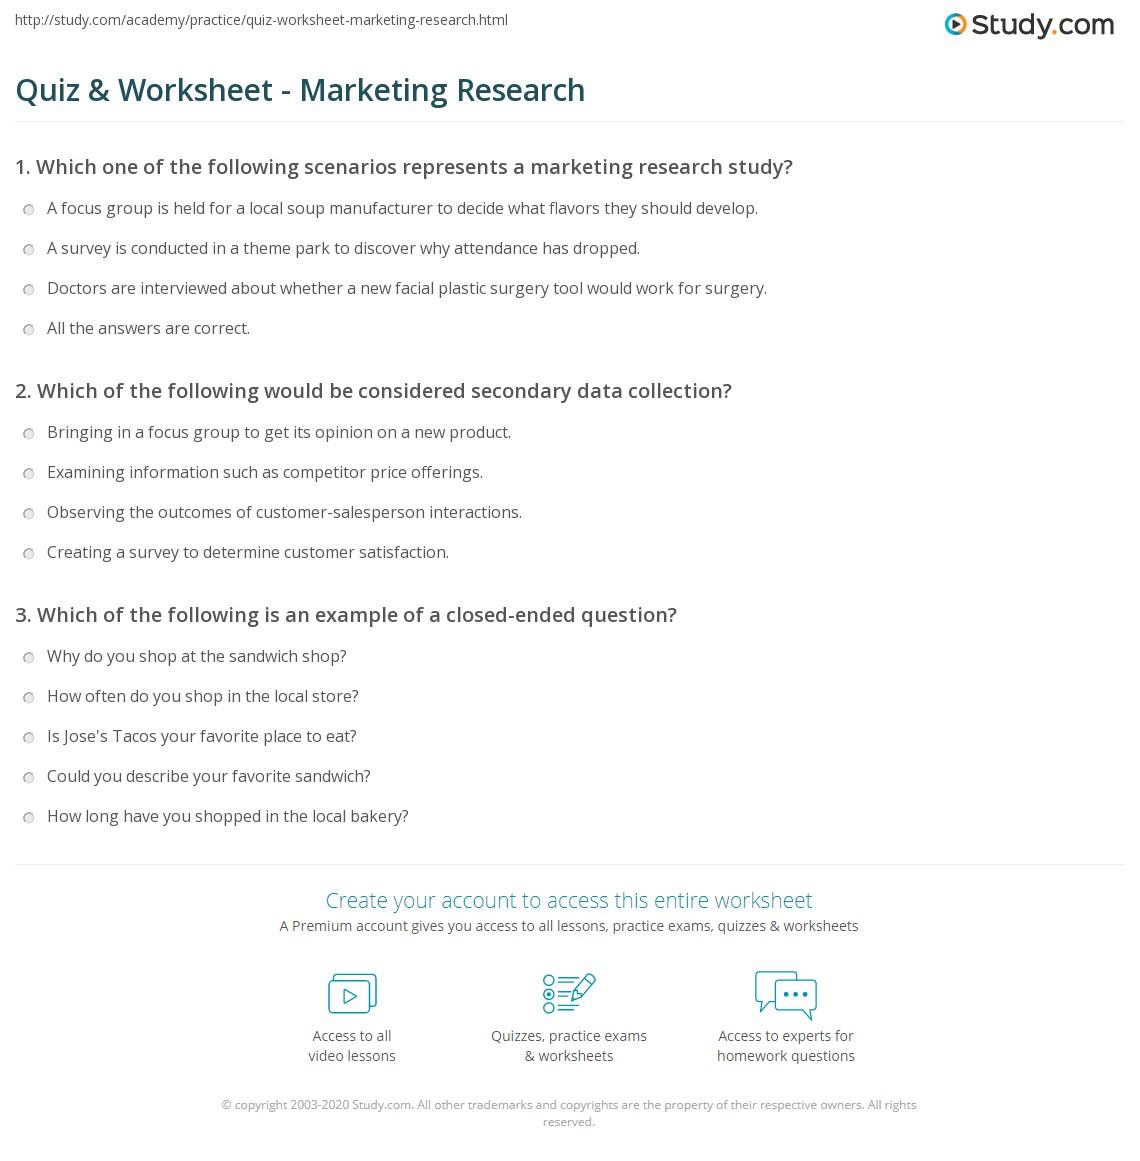 quiz & worksheet - marketing research | study